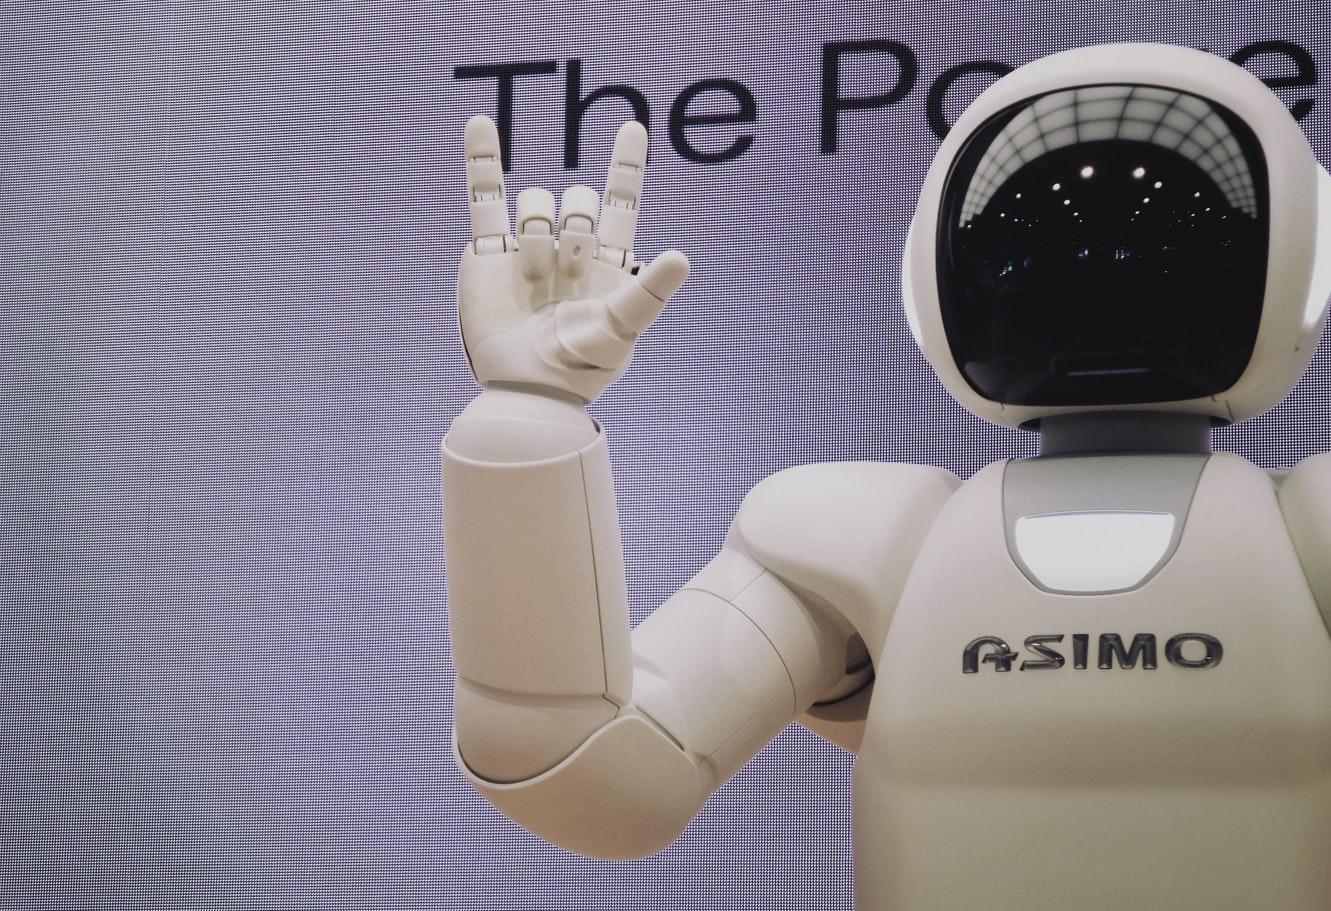 robot restaurant, ai restaurant, ai, robotics